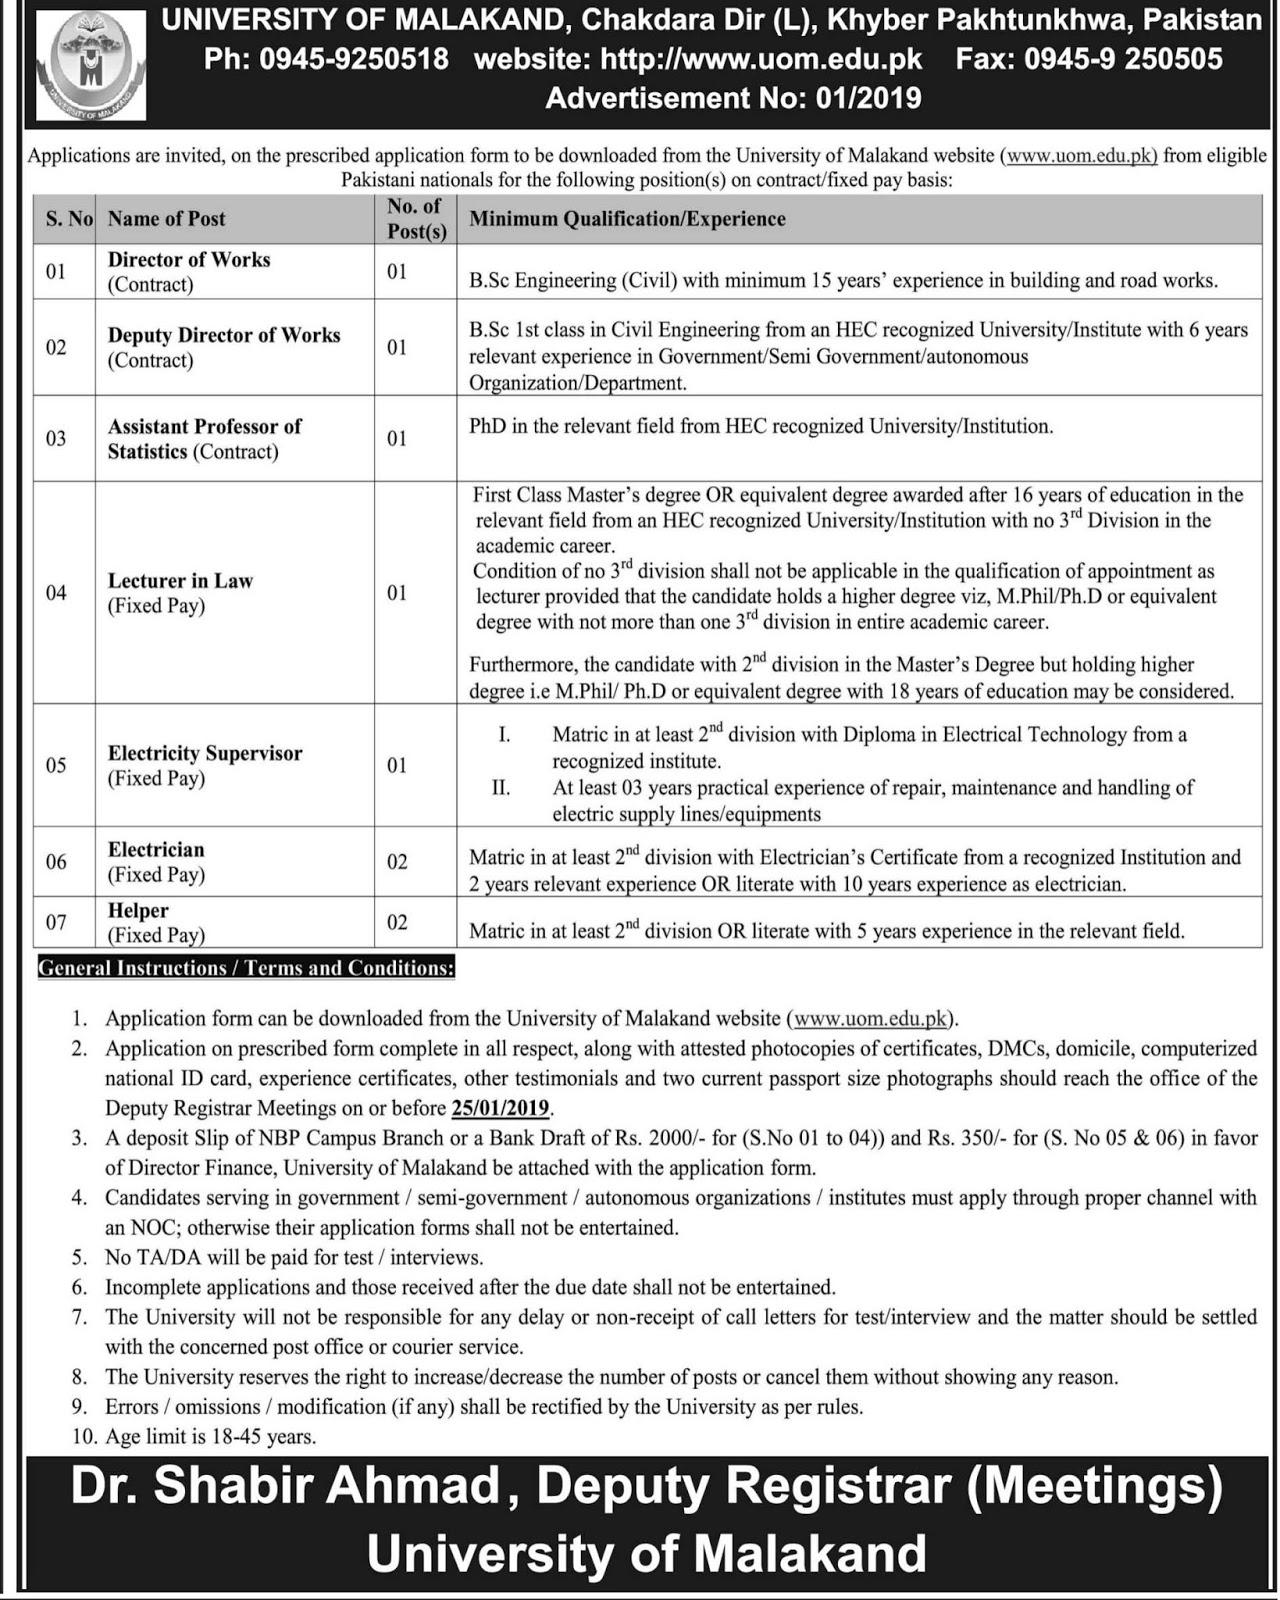 malakand-university-jobs-2019